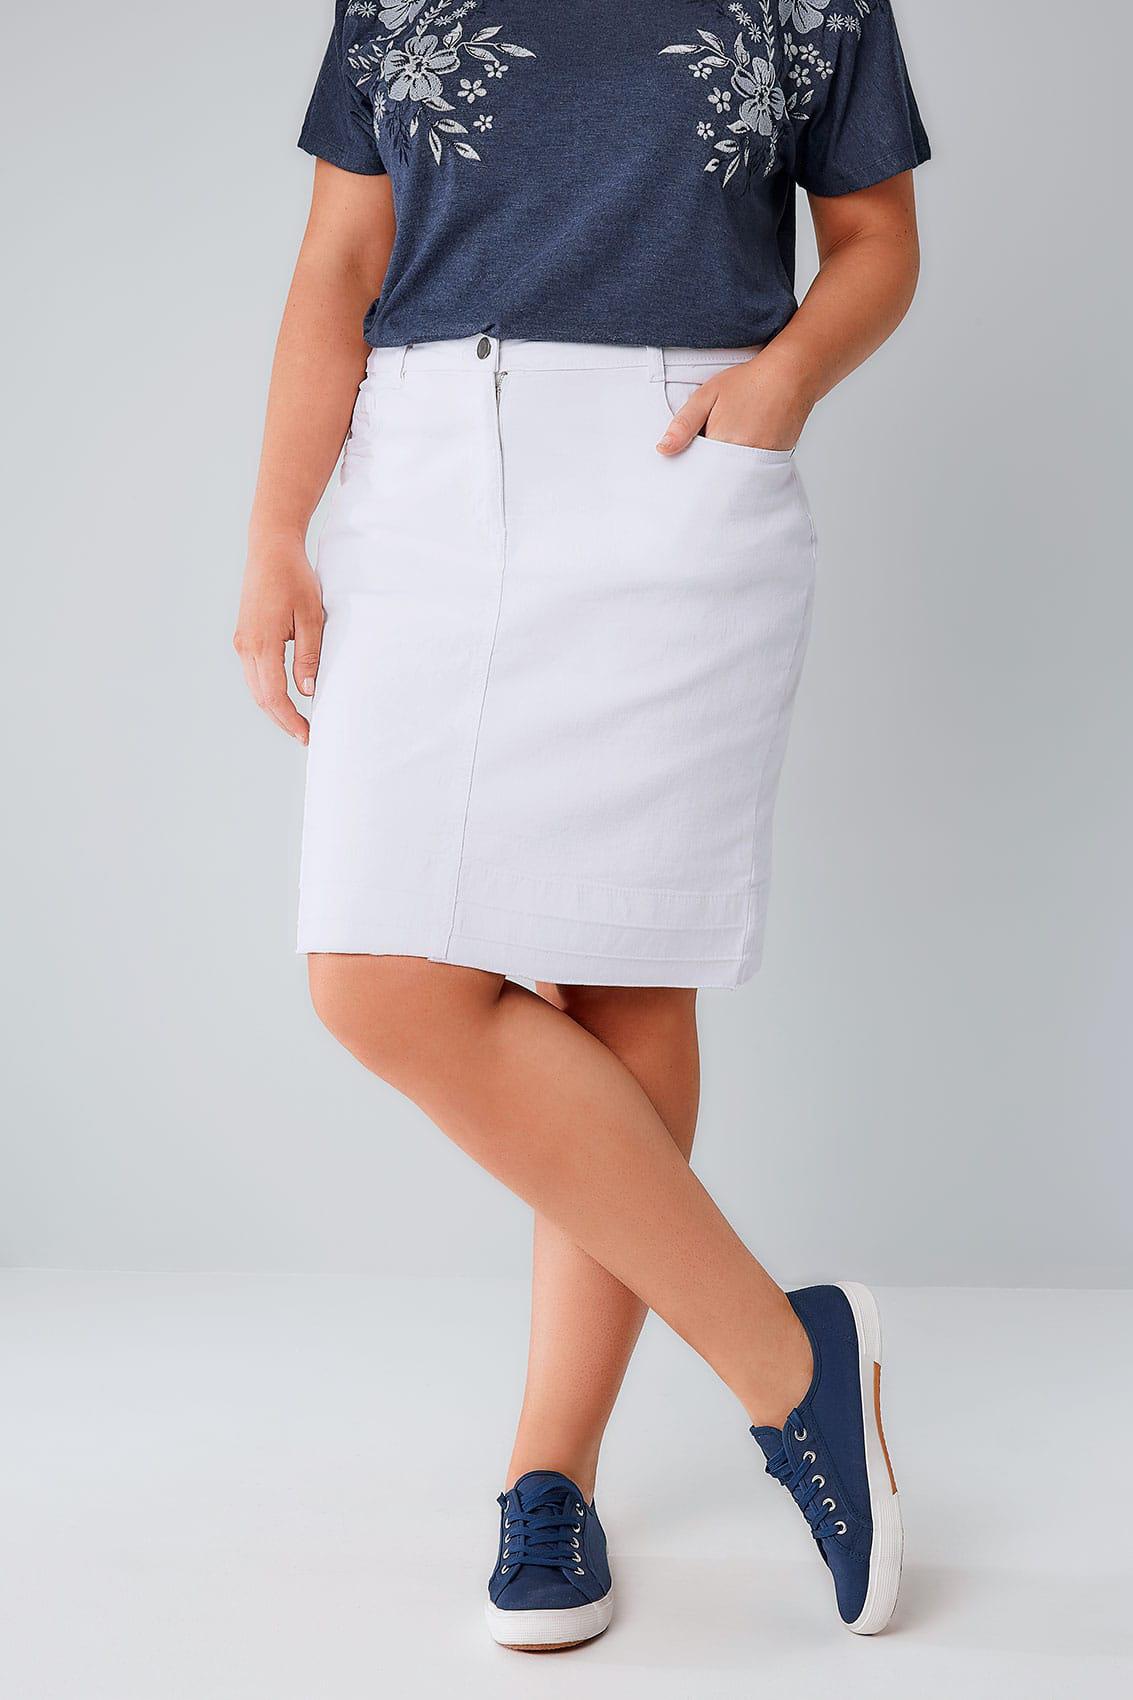 8e33aaa79511 ΦΟΥΣΤΕΣ    Φούστα Denim Midi Λευκή - Μόδα σε μεγάλα μεγέθη